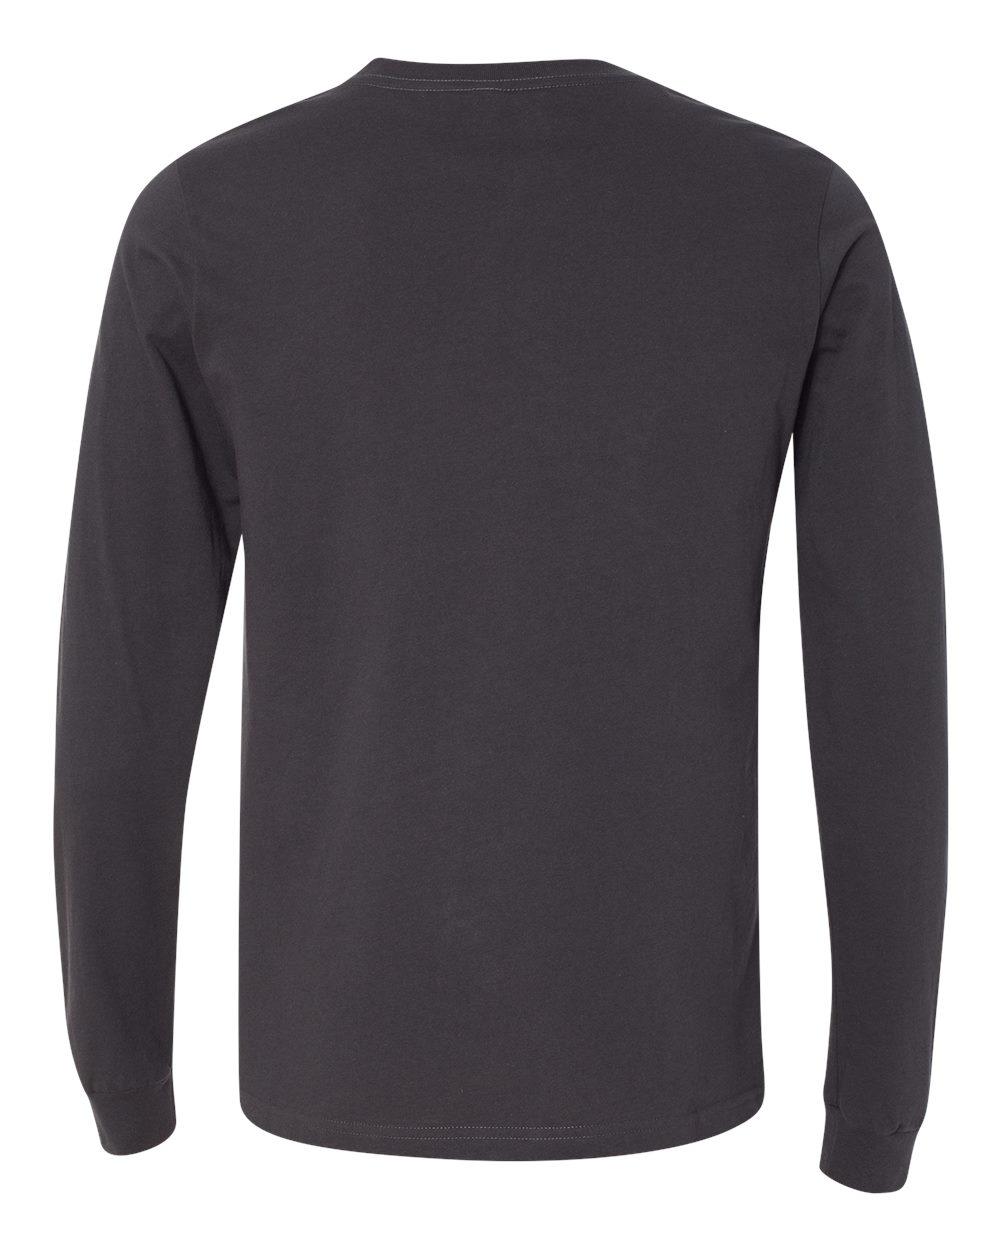 Bella-Canvas-Mens-Blank-Top-Long-Sleeve-Jersey-Tee-T-Shirt-3501-up-to-3XL thumbnail 37